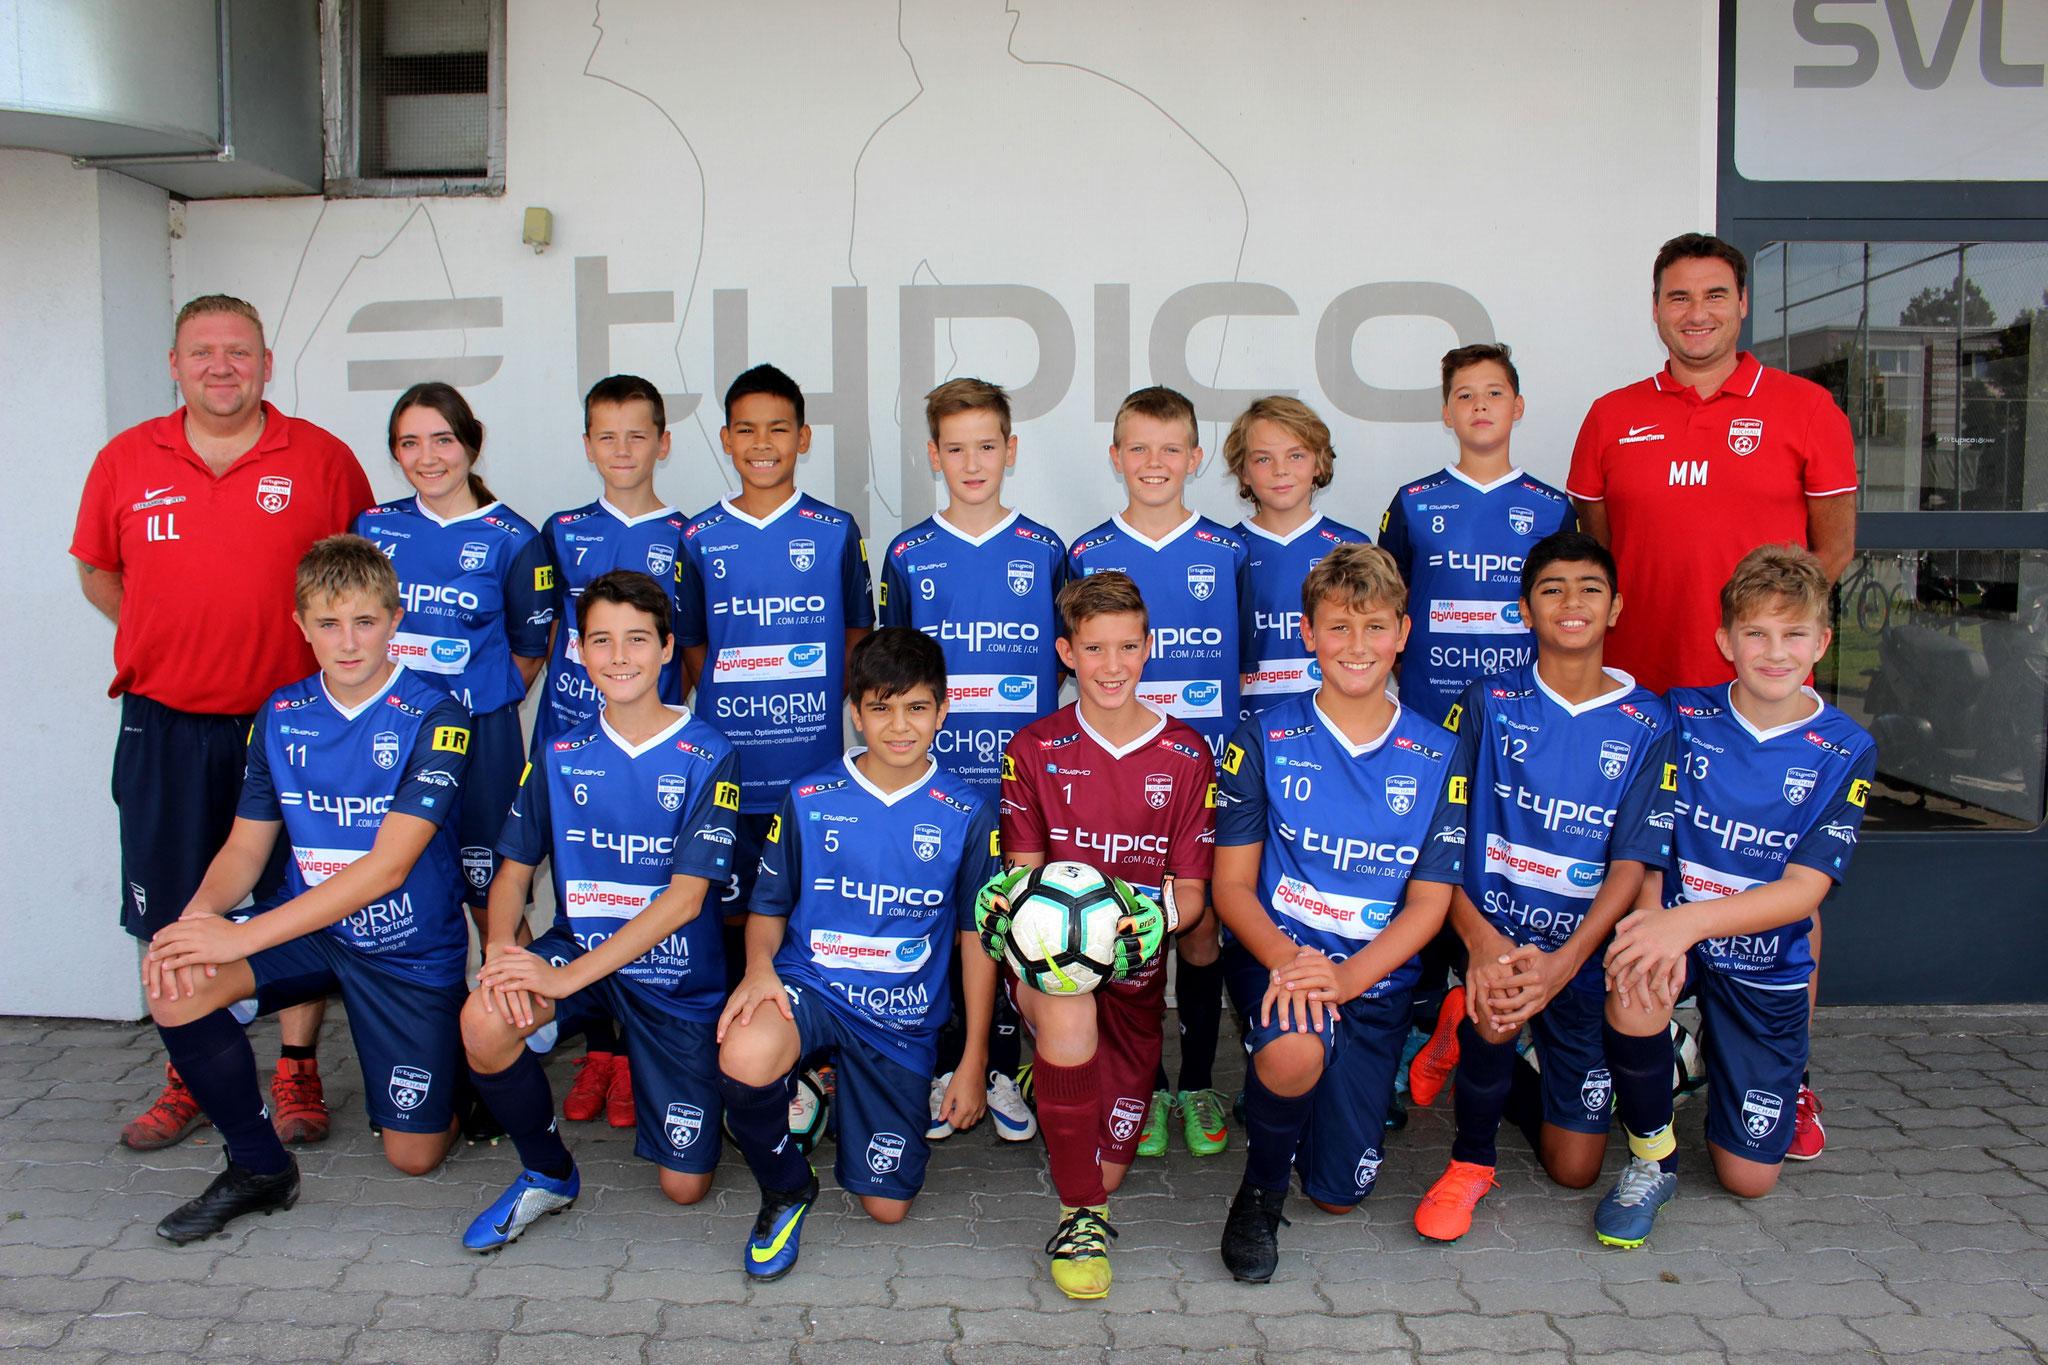 SVL U14 mit Trainer Christian Ill und Co-Trainer Martin Malin